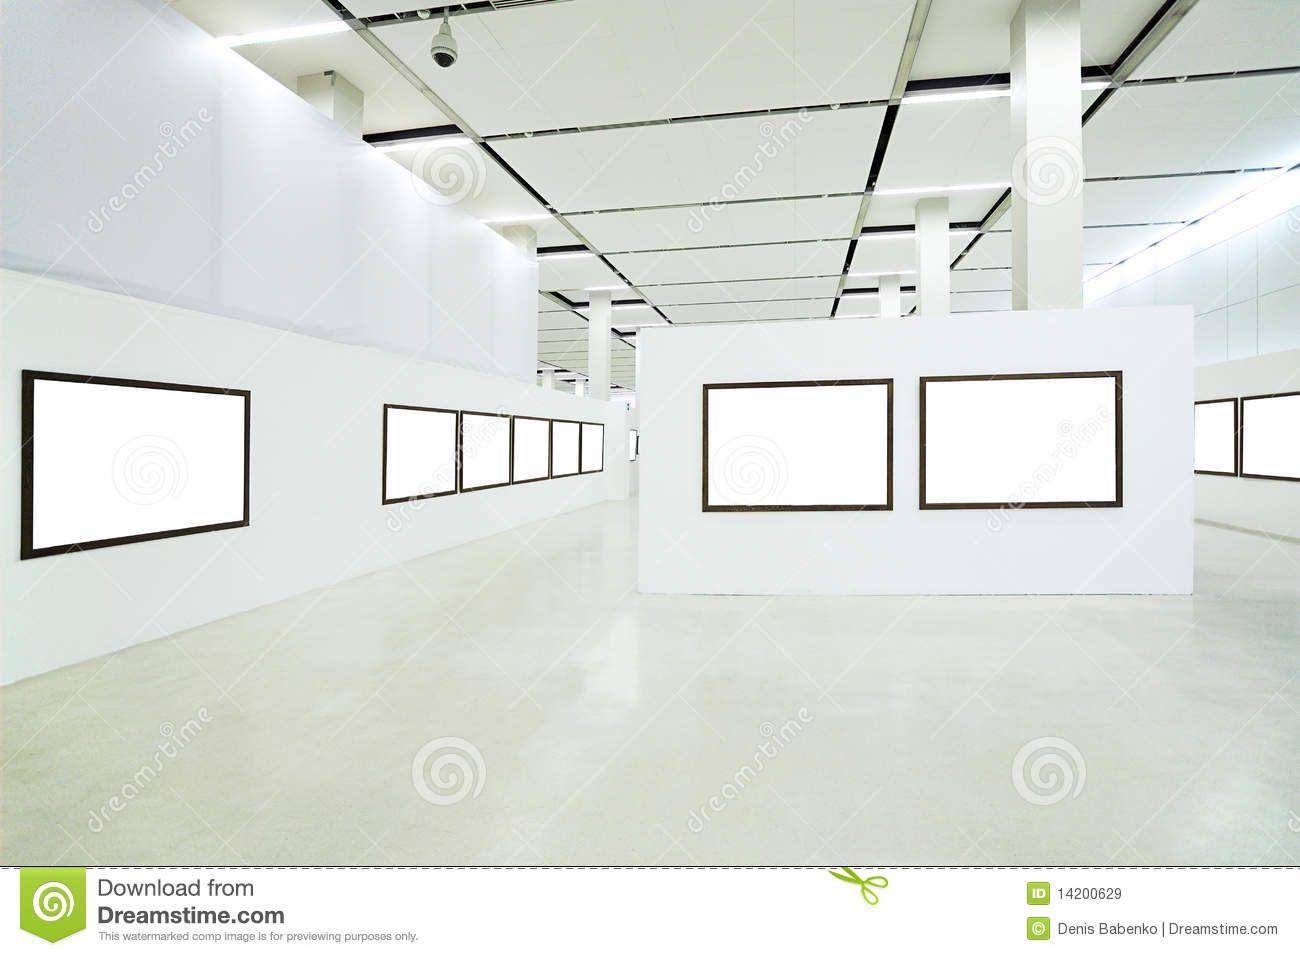 Image Result For Milwaukee Art Museum Interior | MAM | Pinterest |  Architecture